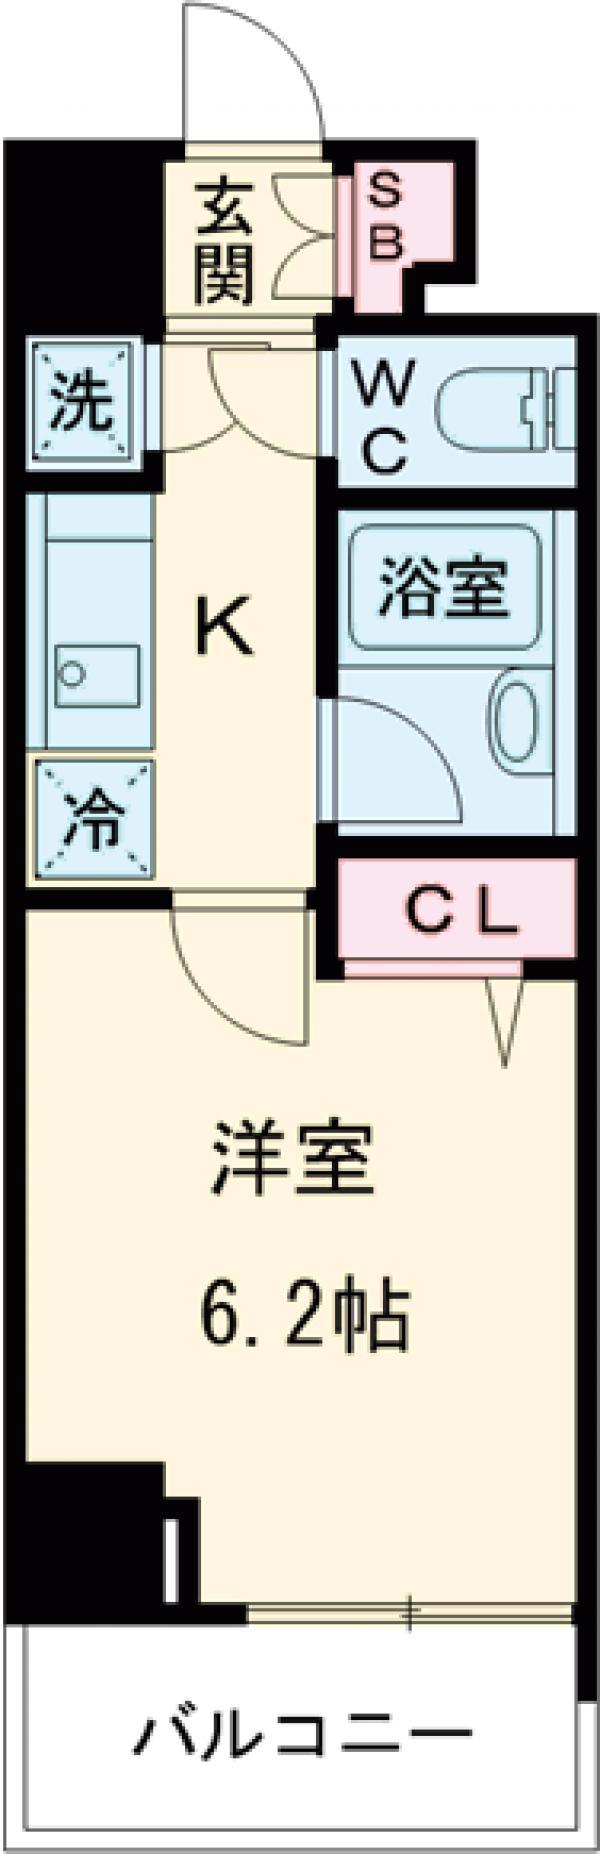 HF早稲田レジデンス 1103号室の間取り